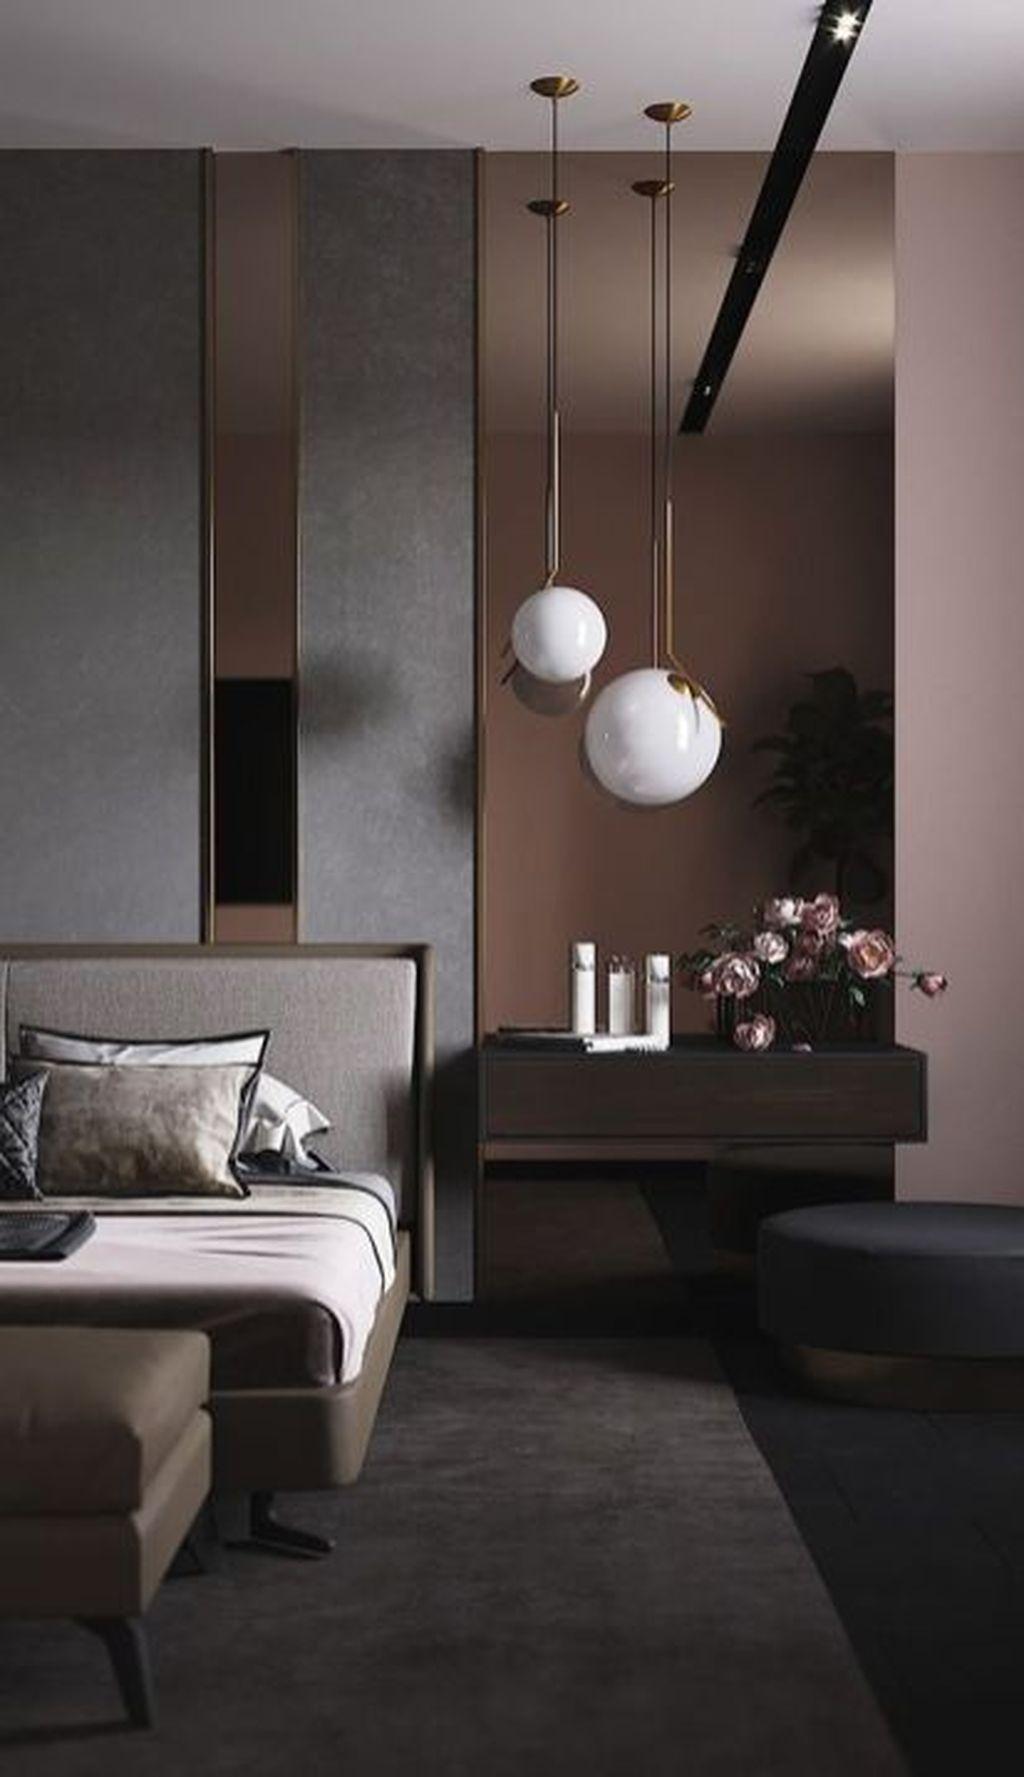 50 Gorgeous Modern Bedroom Decor Ideas - HOMYHOMEE